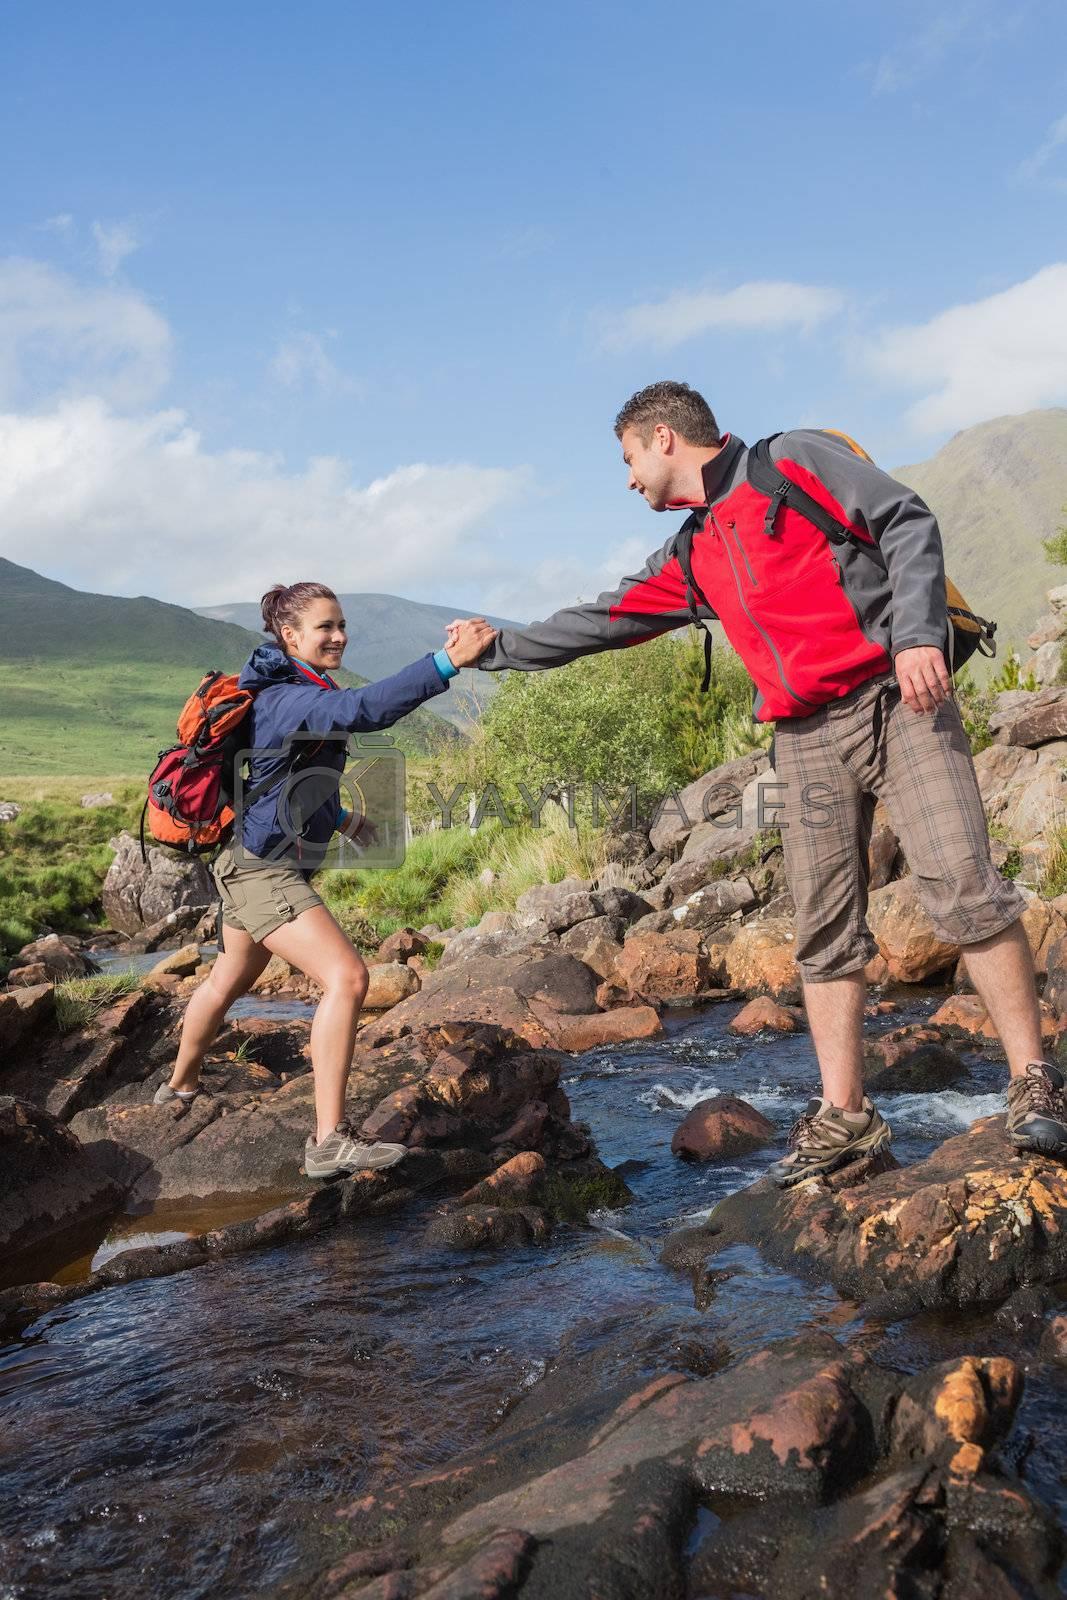 Man helping his pretty girlfriend to cross a river by Wavebreakmedia